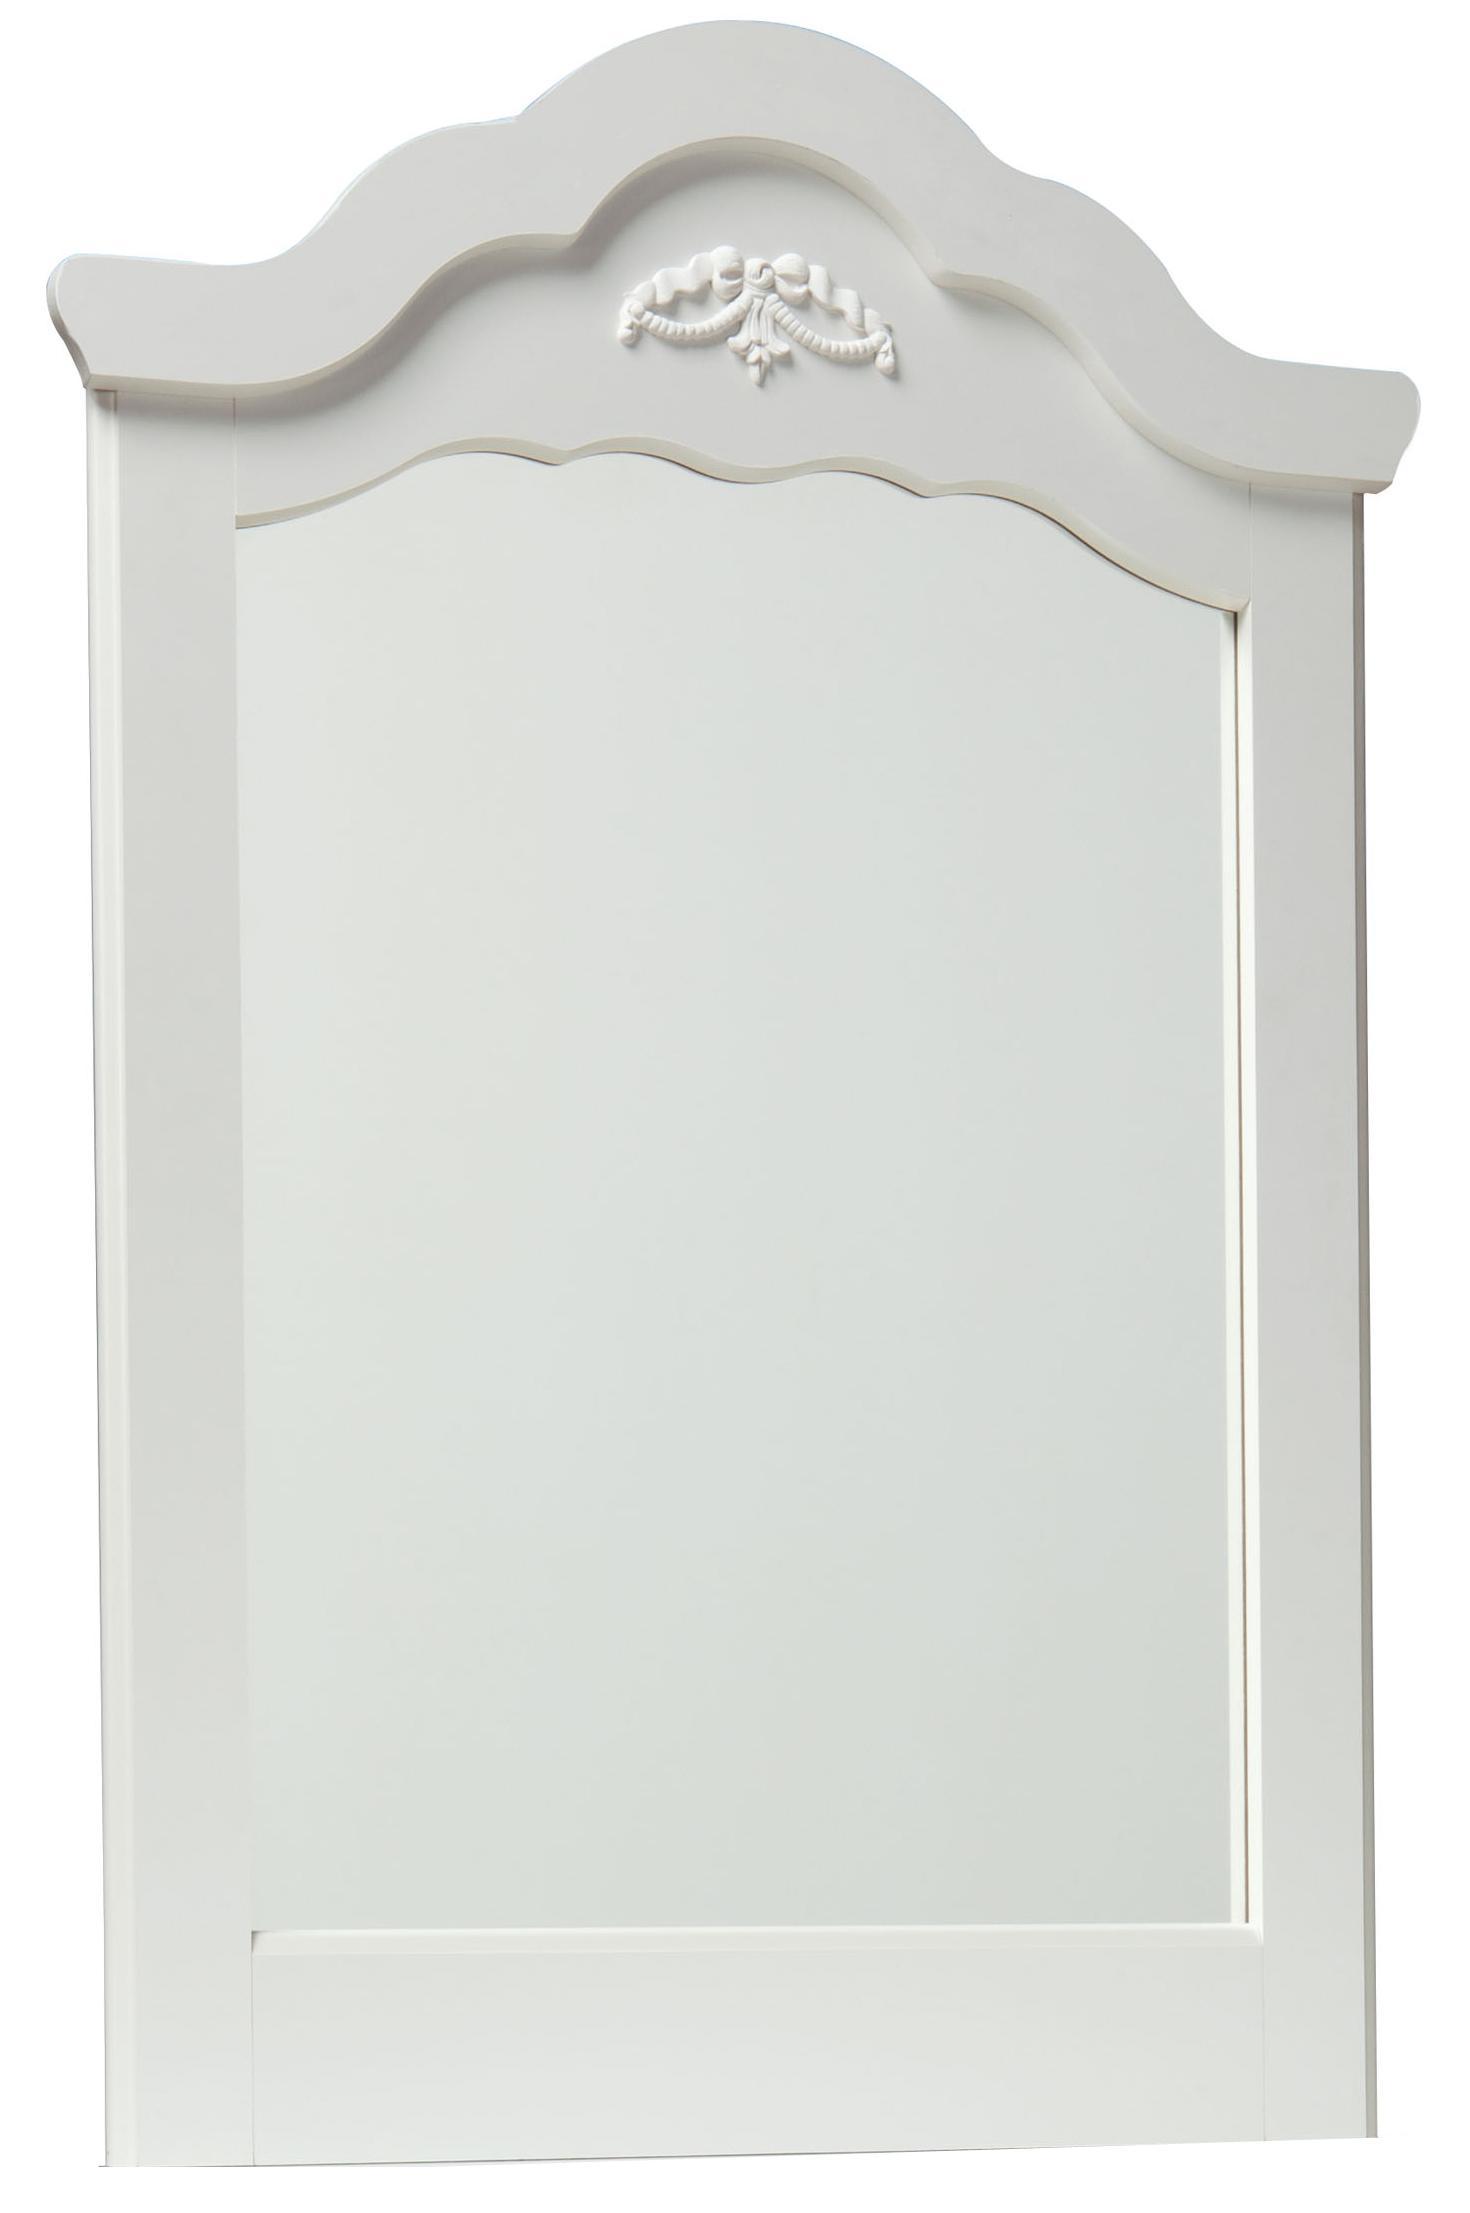 Standard Furniture Daphne Panel Mirror - Item Number: 65568